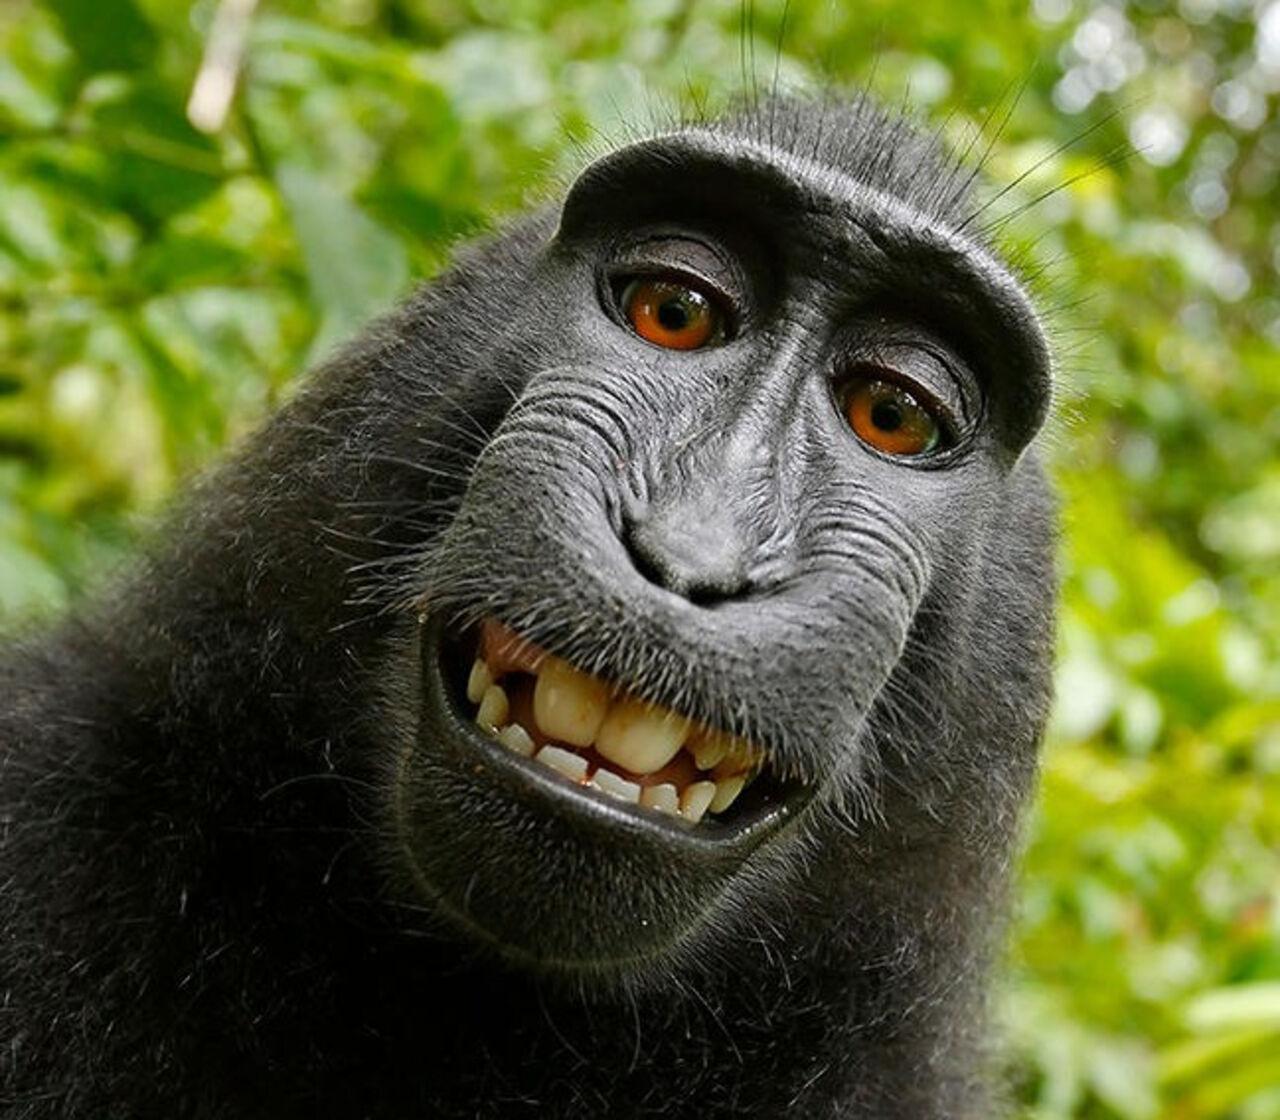 Фотограф одержал победу  узоозащитников суд поделу оселфи обезъяны